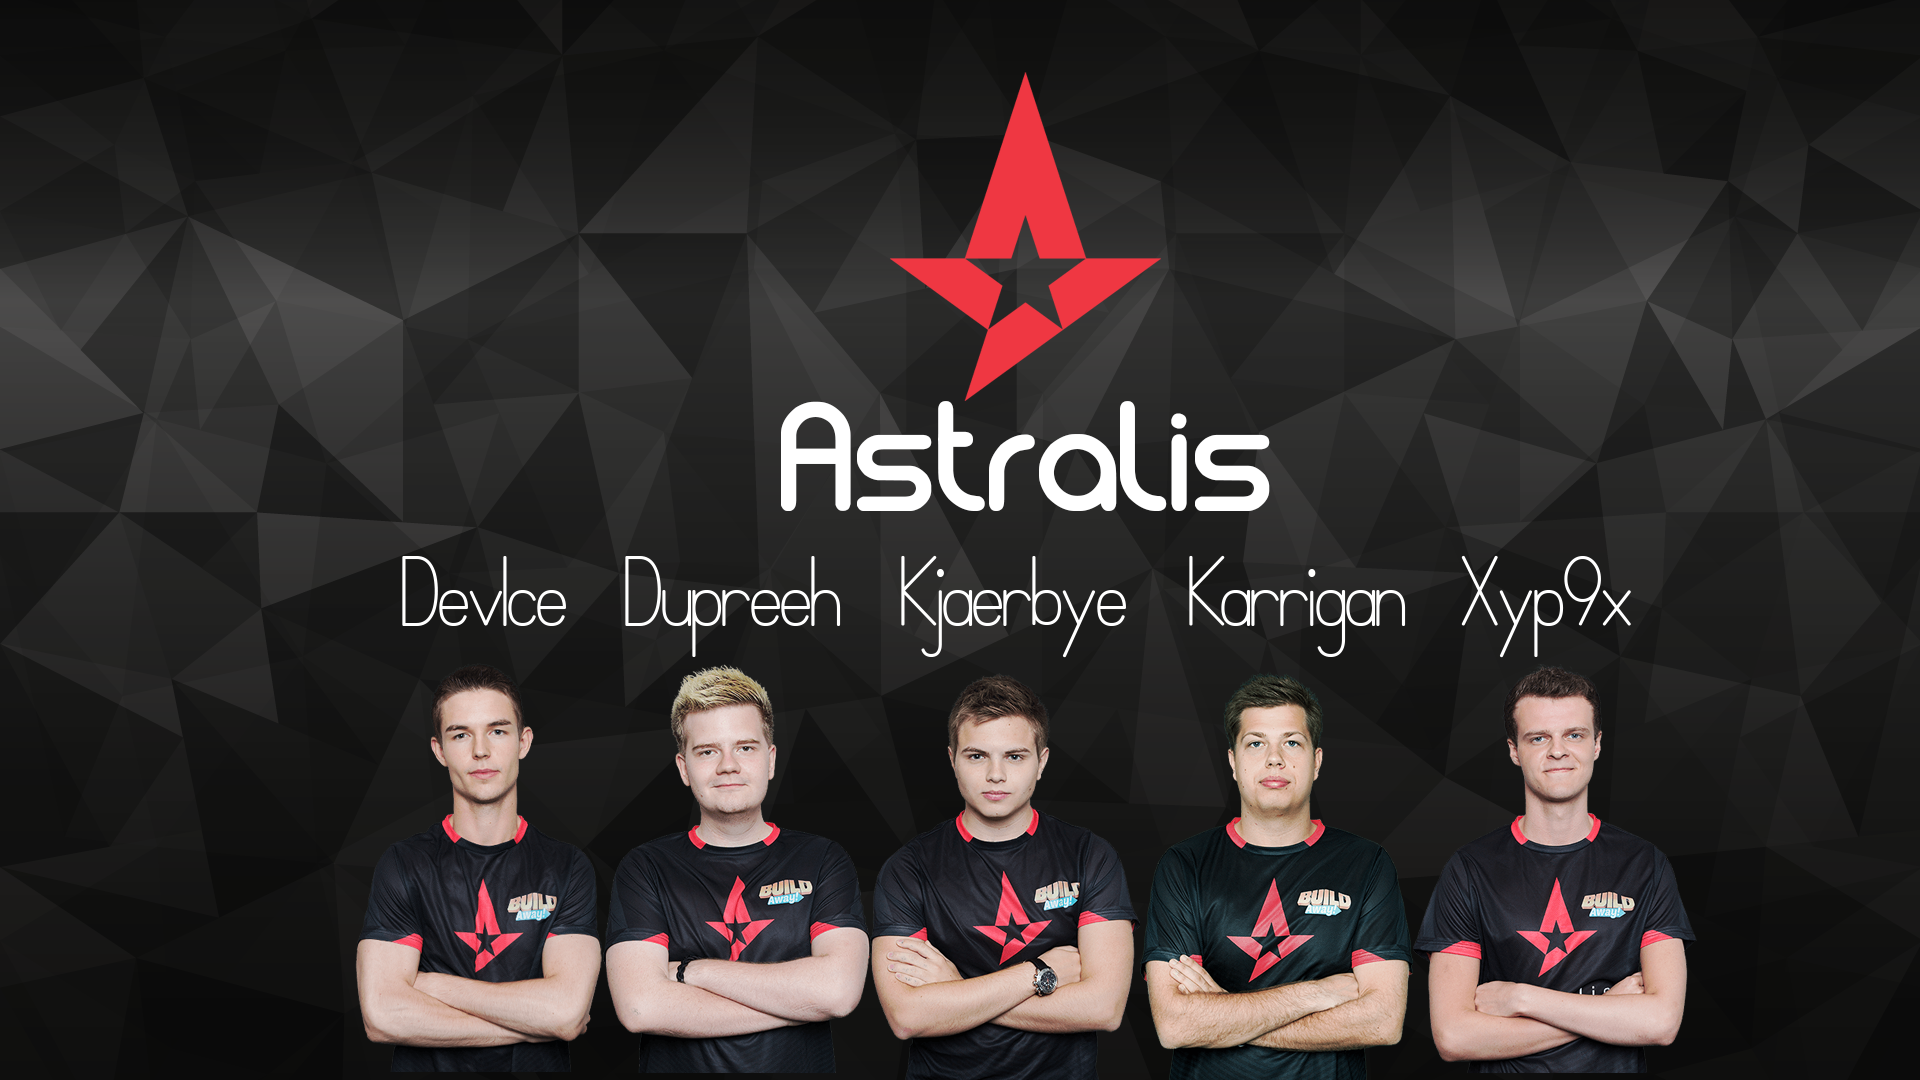 AstralisGG Wallpaper (New Roster)!